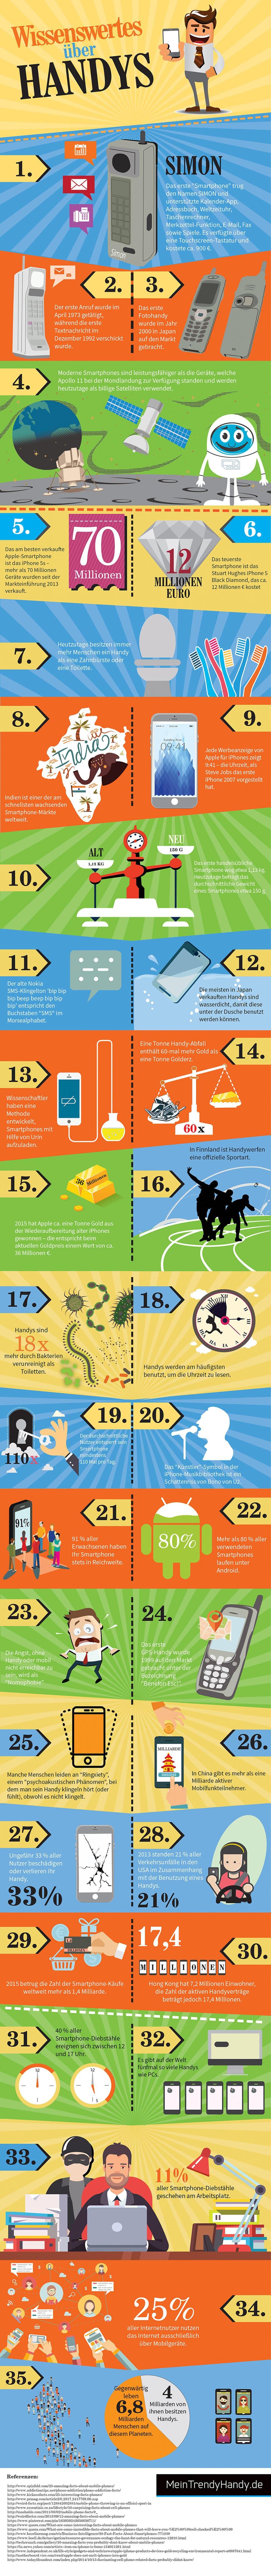 35 Facts über Handys